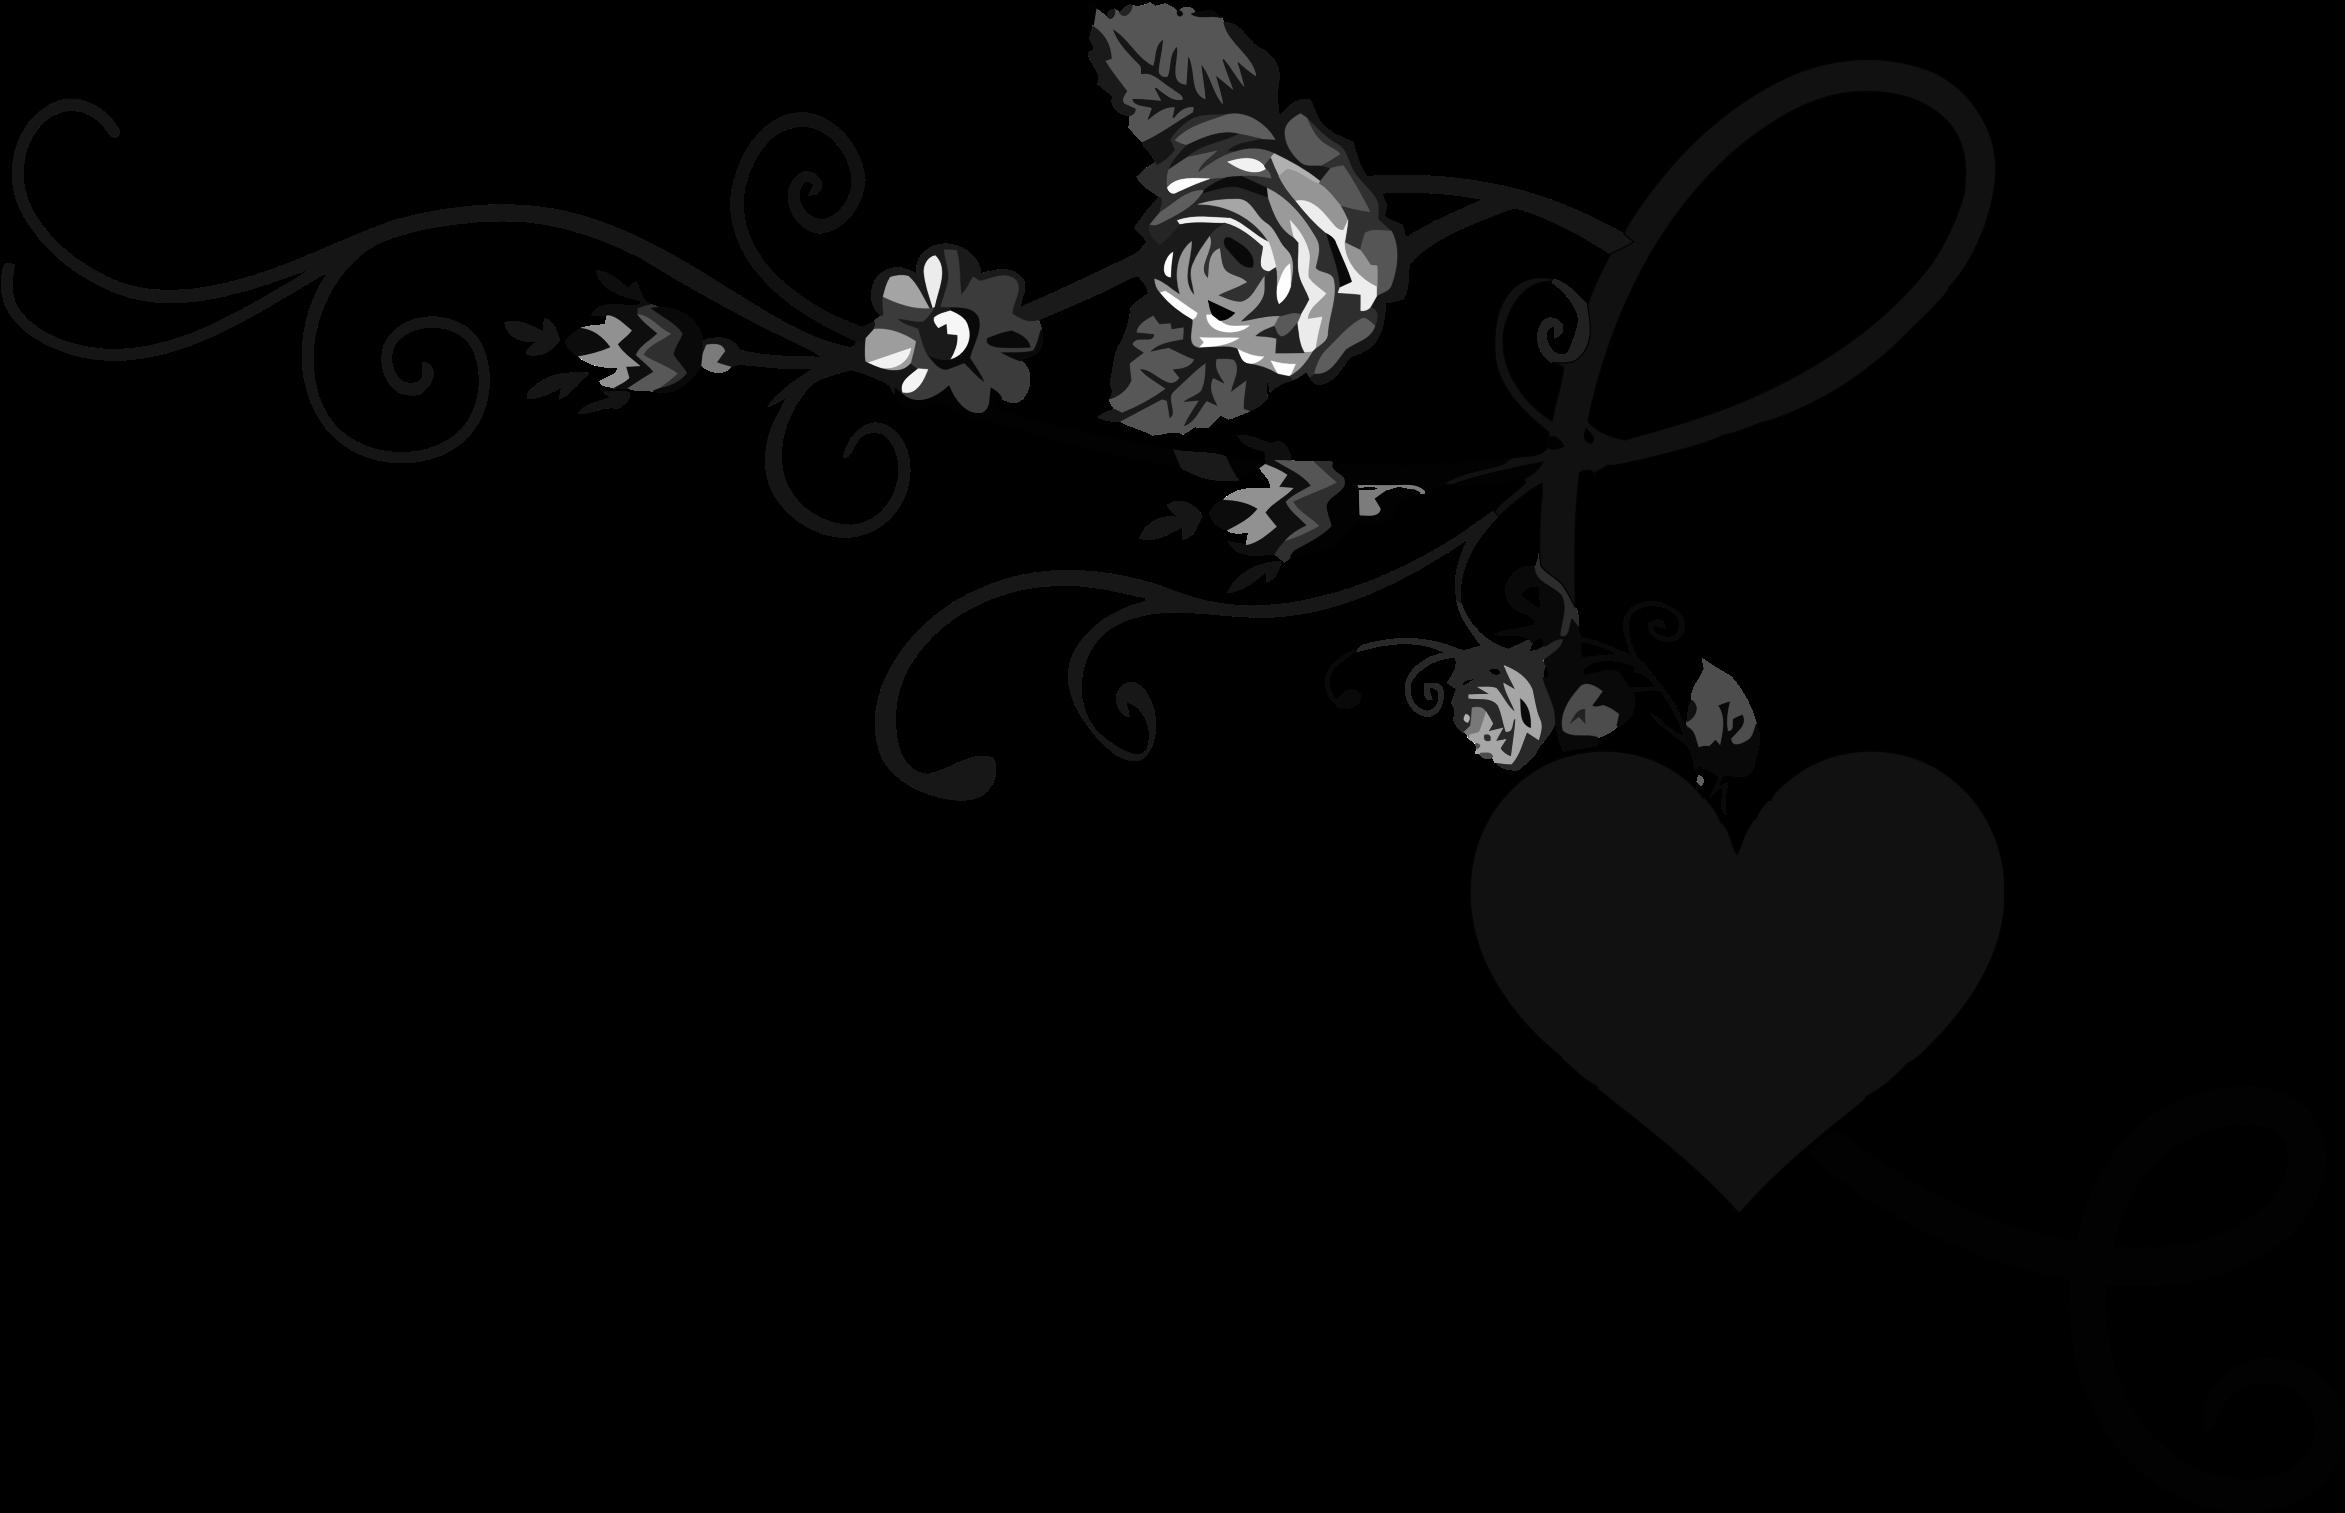 Floral clipart rose. Flourish big image png